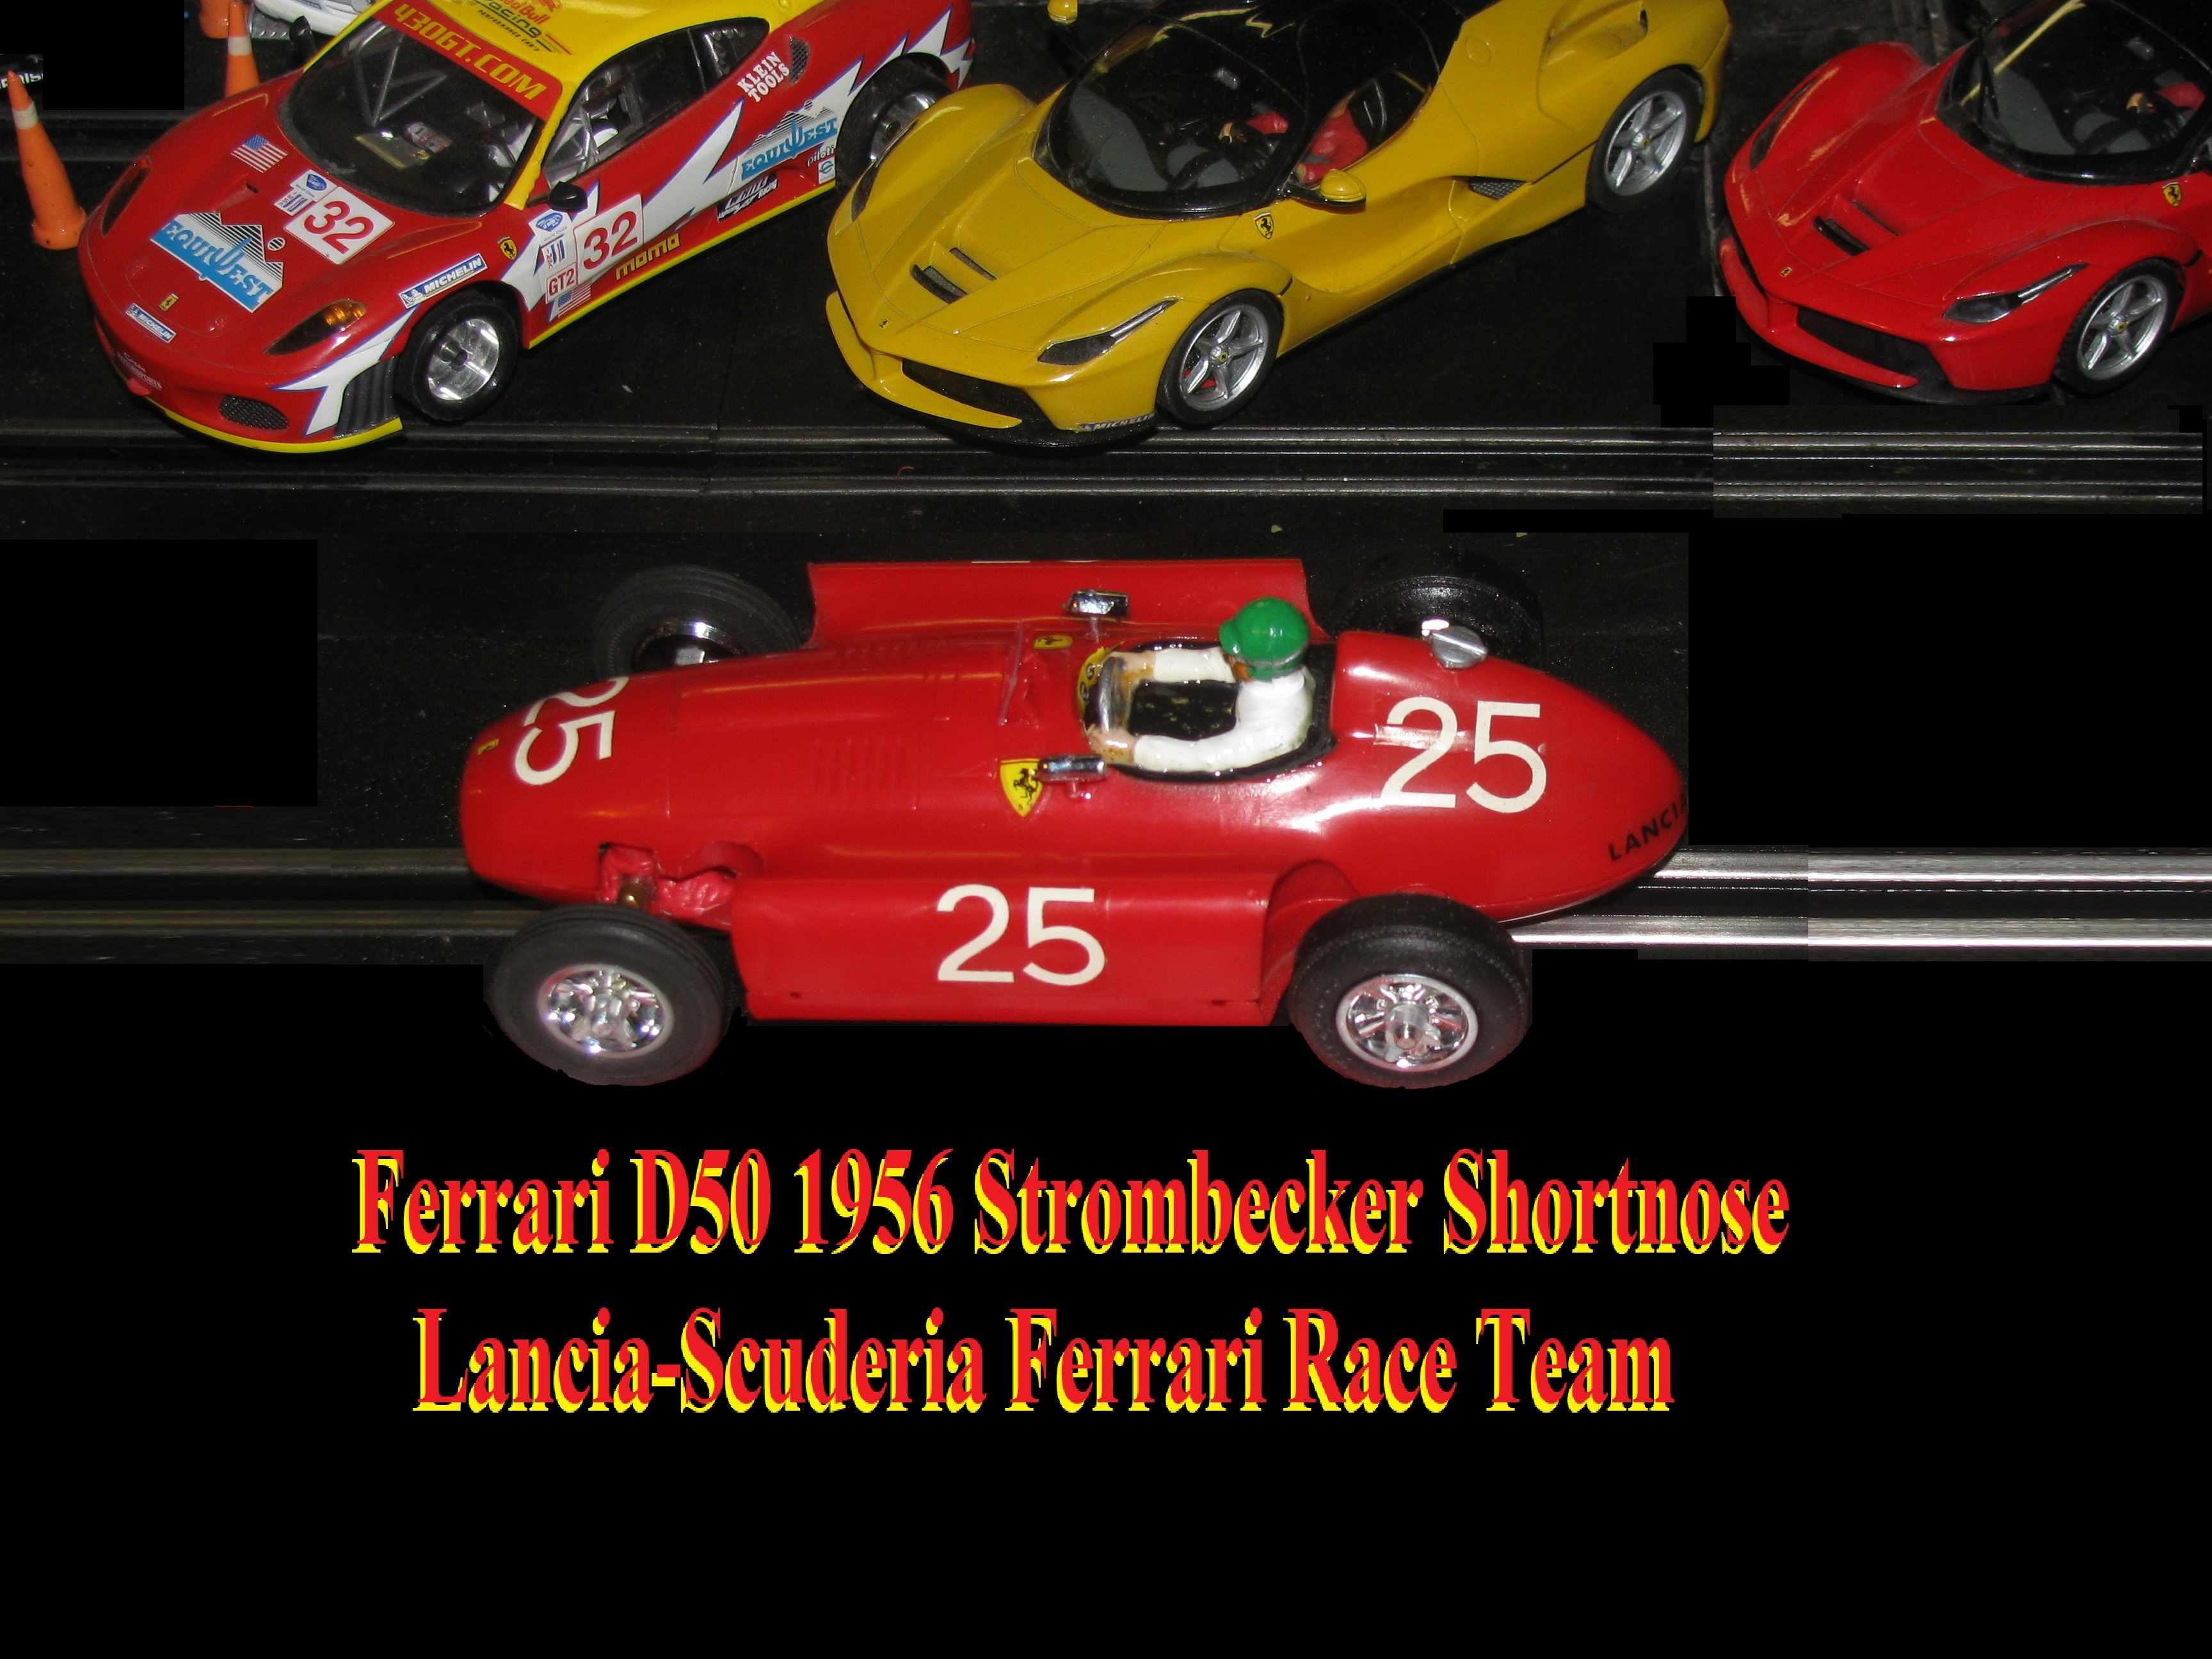 * Winter Super Sale * Ferrari D50 1956 Lancia-Scuderia Ferrari Race Team by Strombecker Ver.C Shortnose 1:24 Scale Slot Car #25